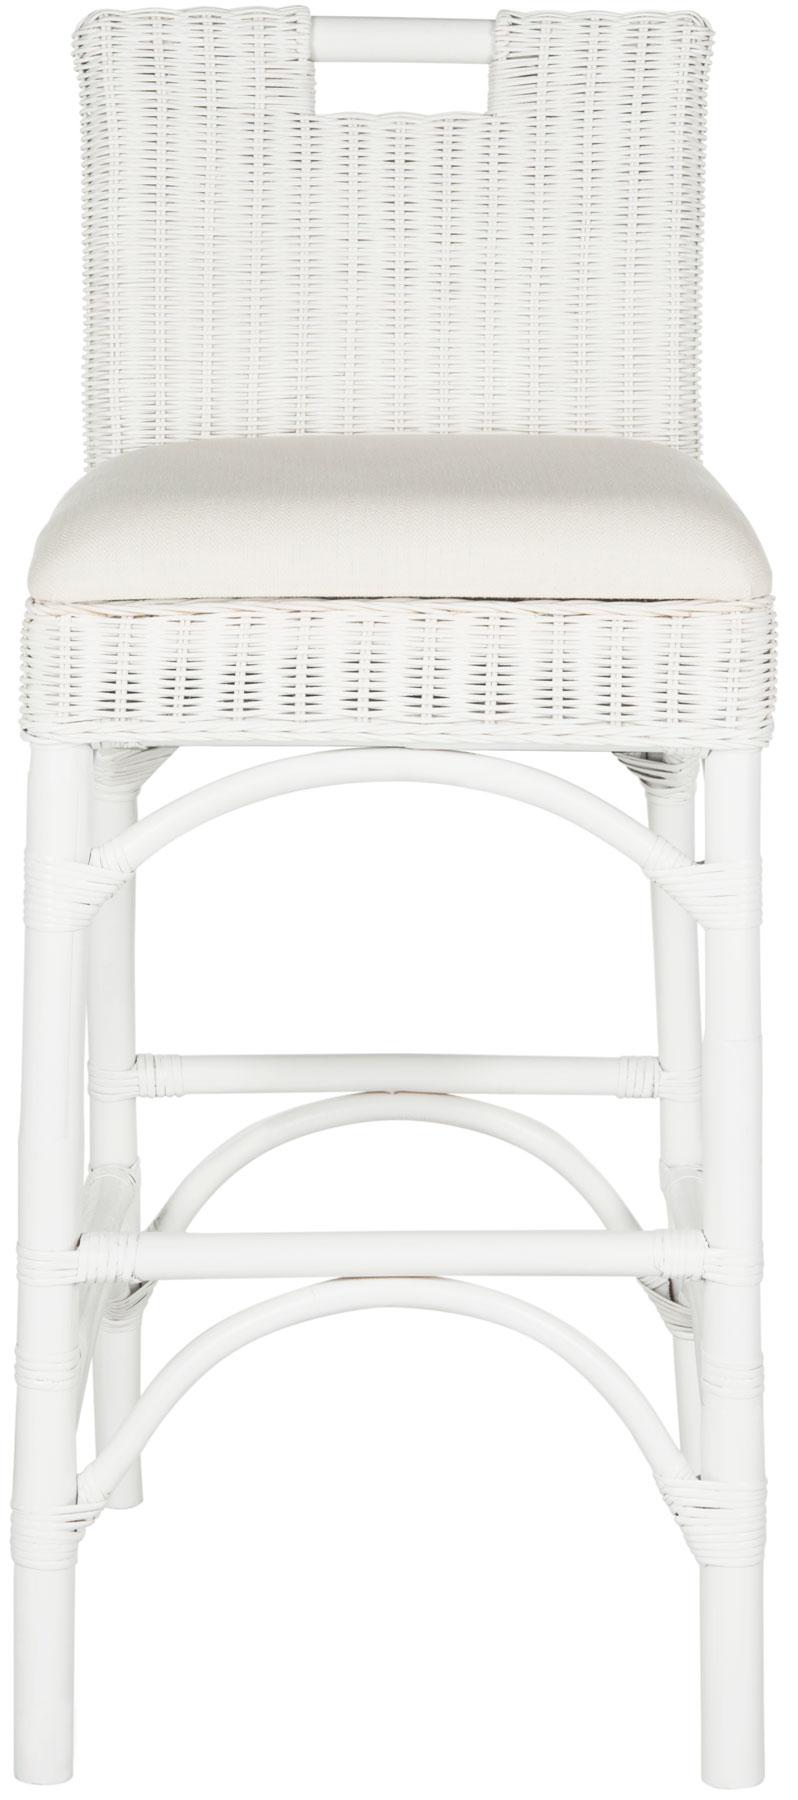 FOX6532B Bar Stools Furniture By Safavieh